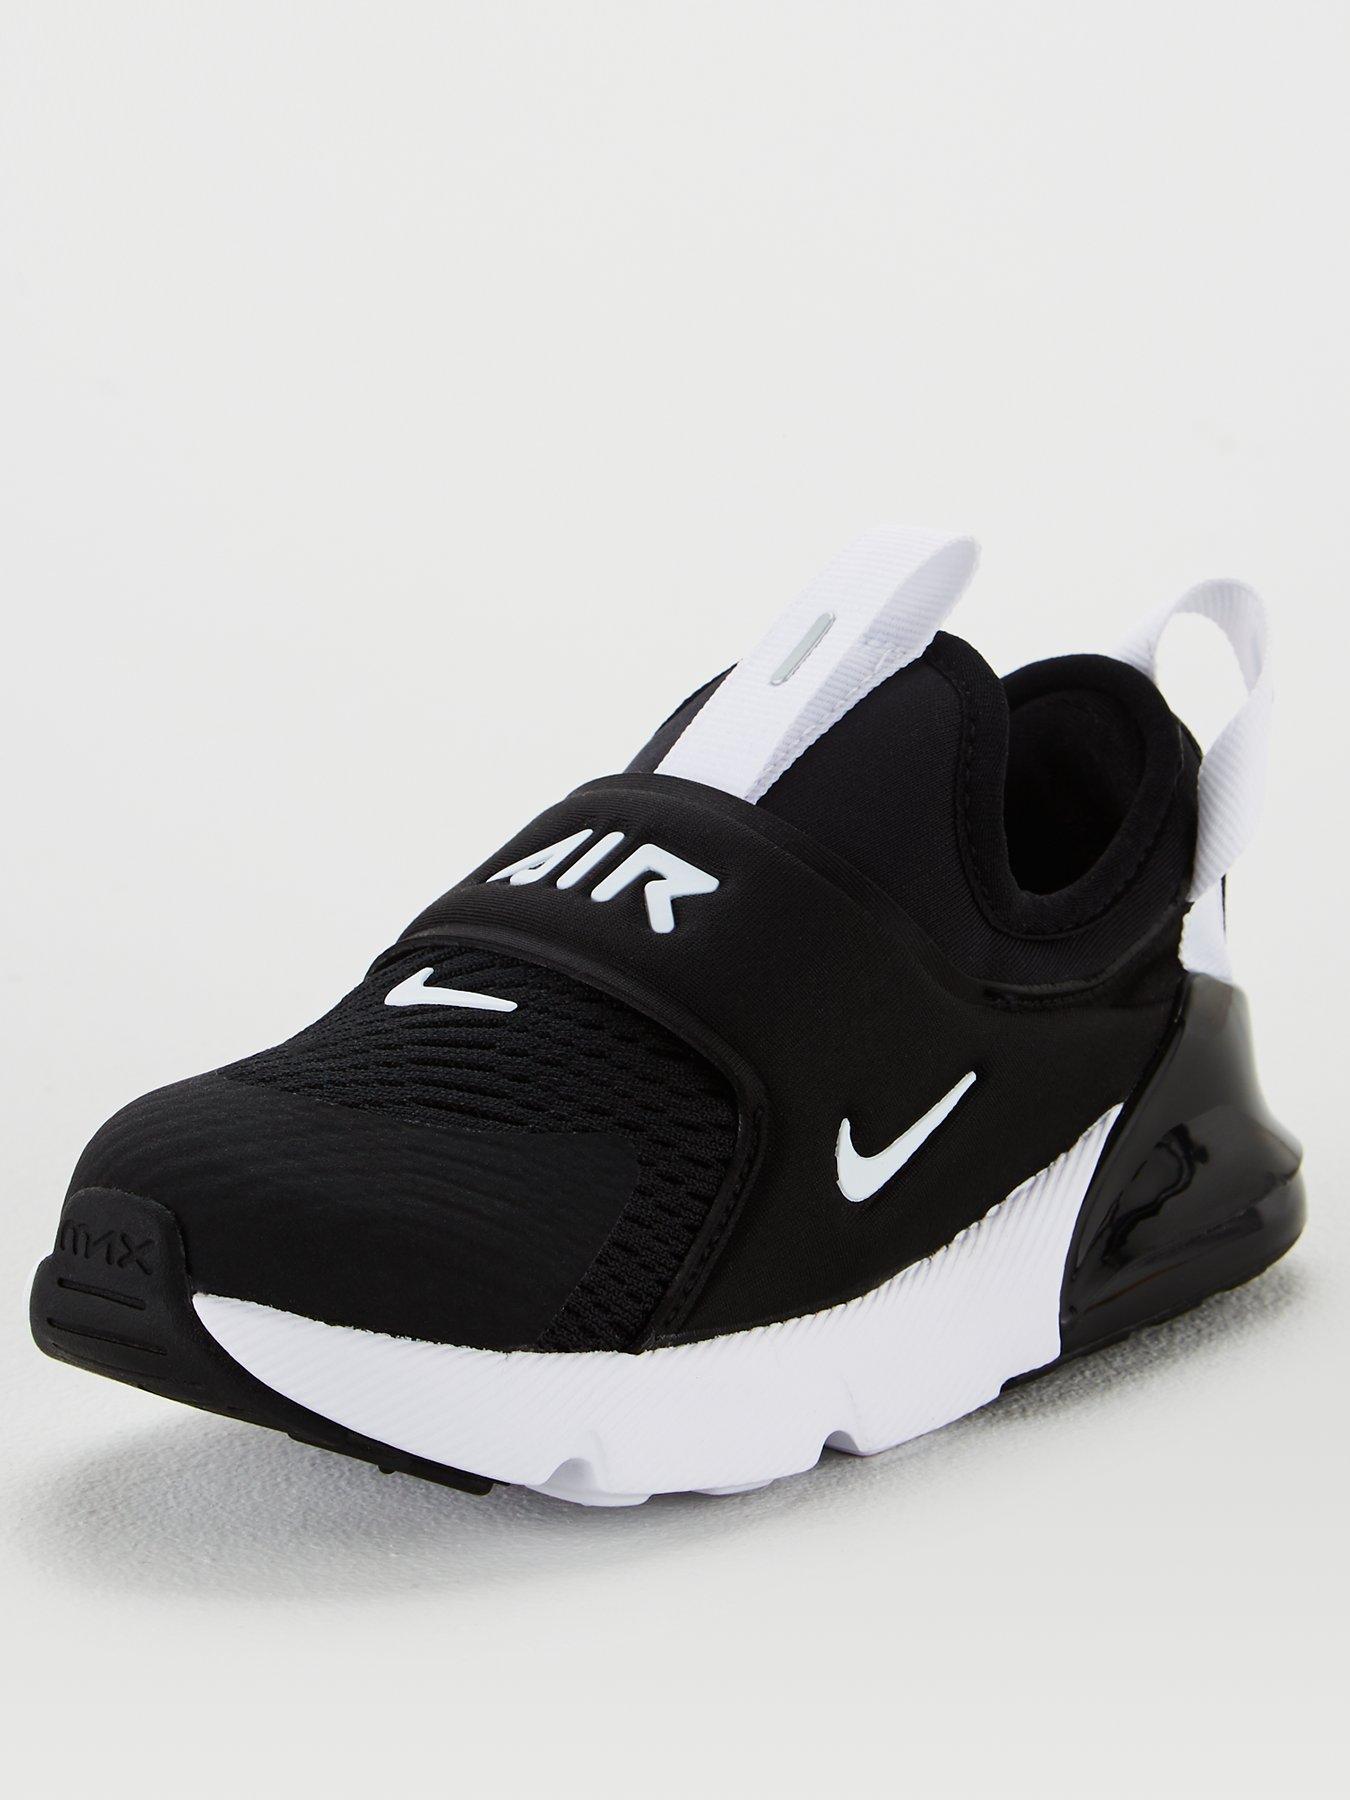 Trendy Casual Mesh Trainers Children Girls Boys Breath Running Sneakers 10.5-2